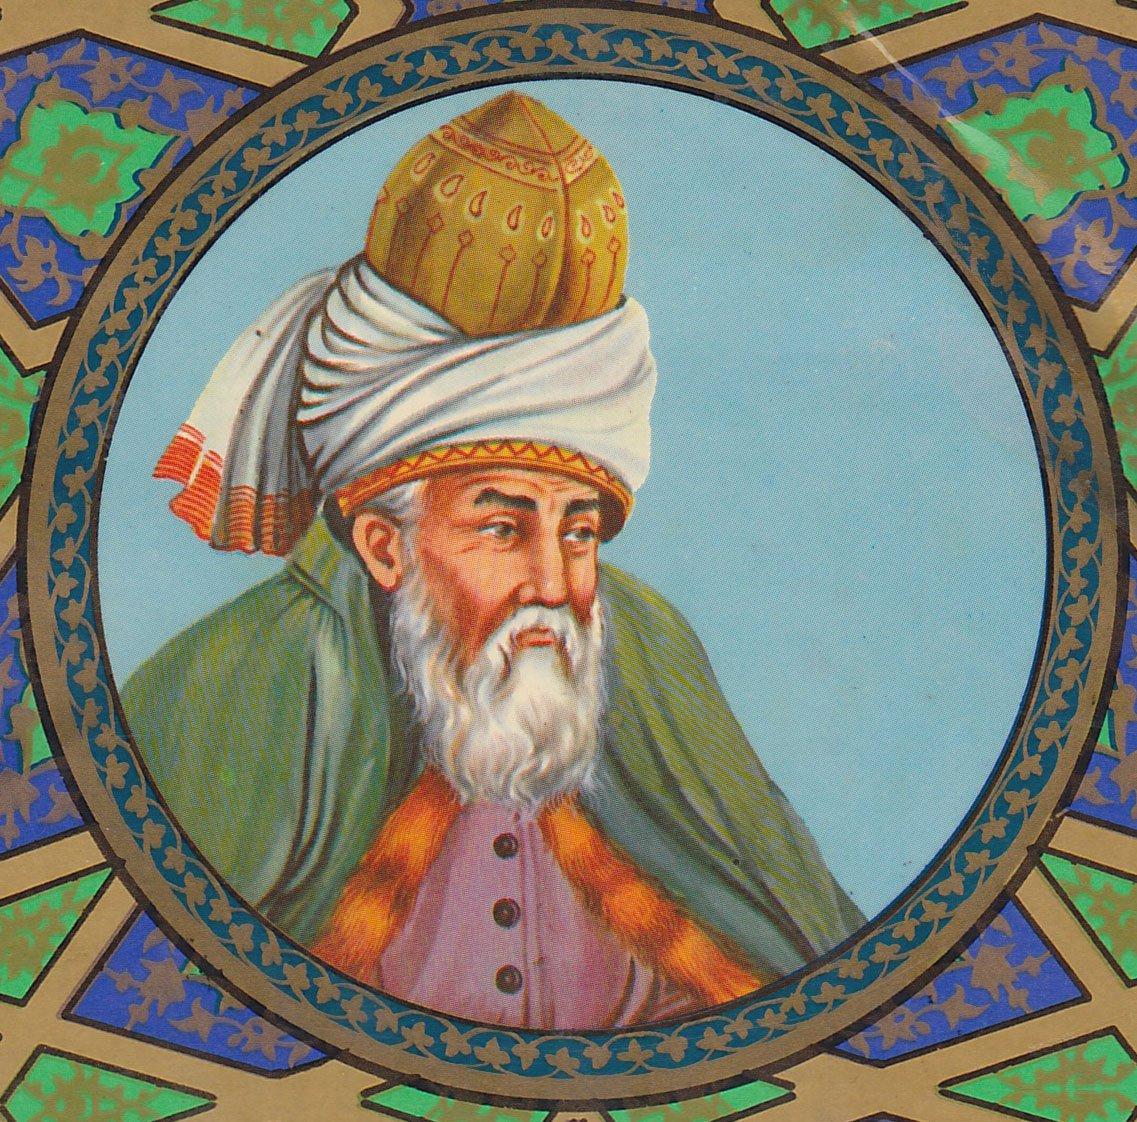 Shams Tabrizi, The Homeless Wanderer Who Mentored Rumi And